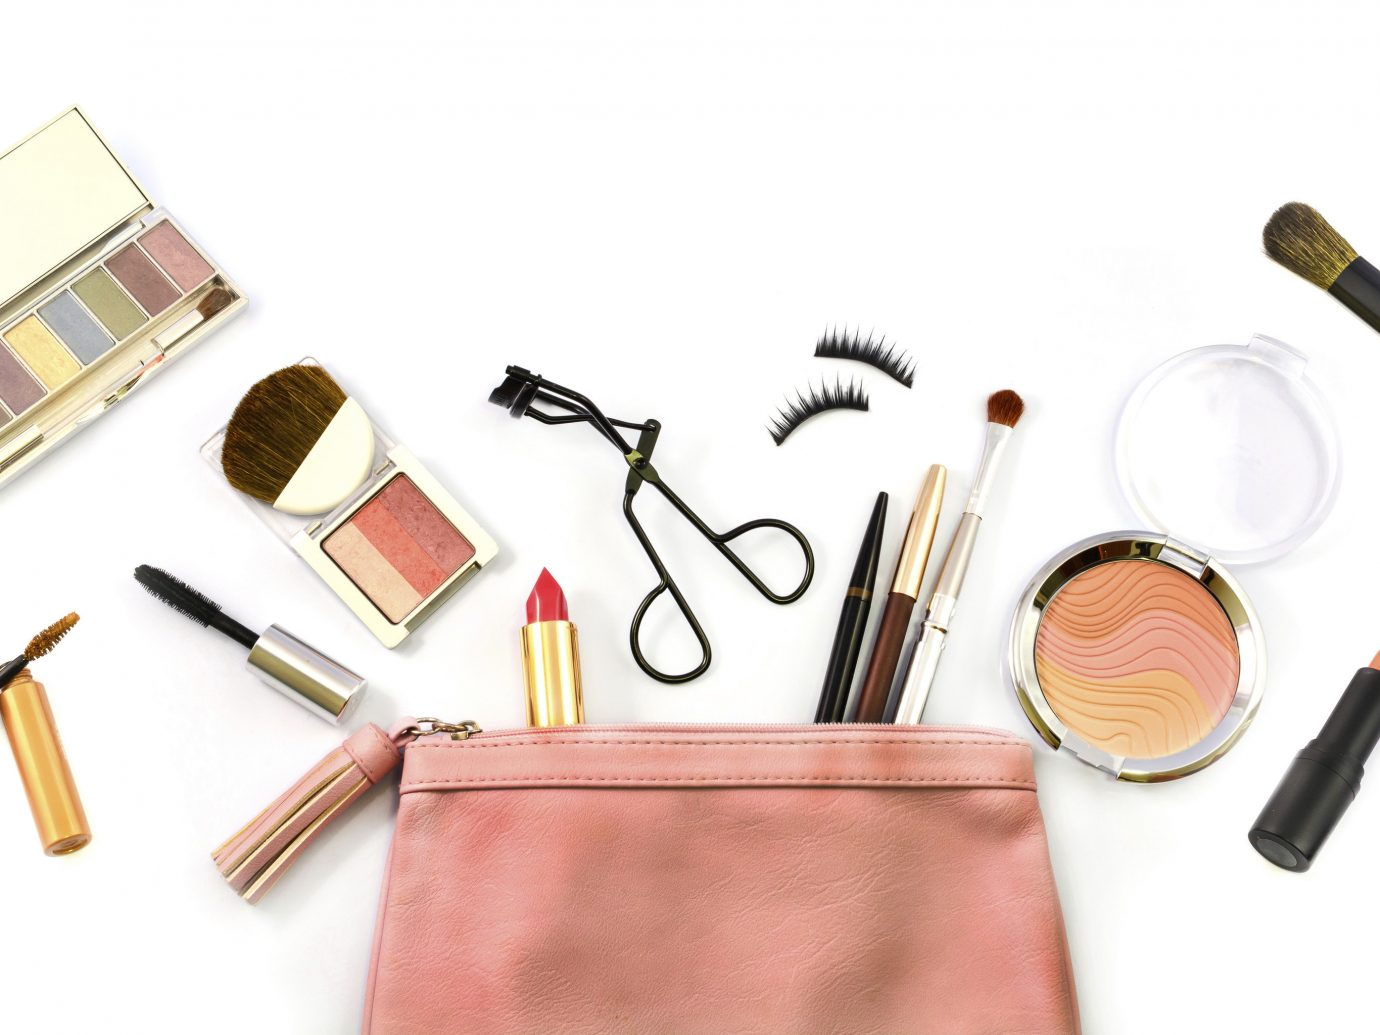 Health + Wellness Spa Retreats Travel Tips wall indoor Beauty eye items organ product cosmetics eyelash brand hand cosmetic human body